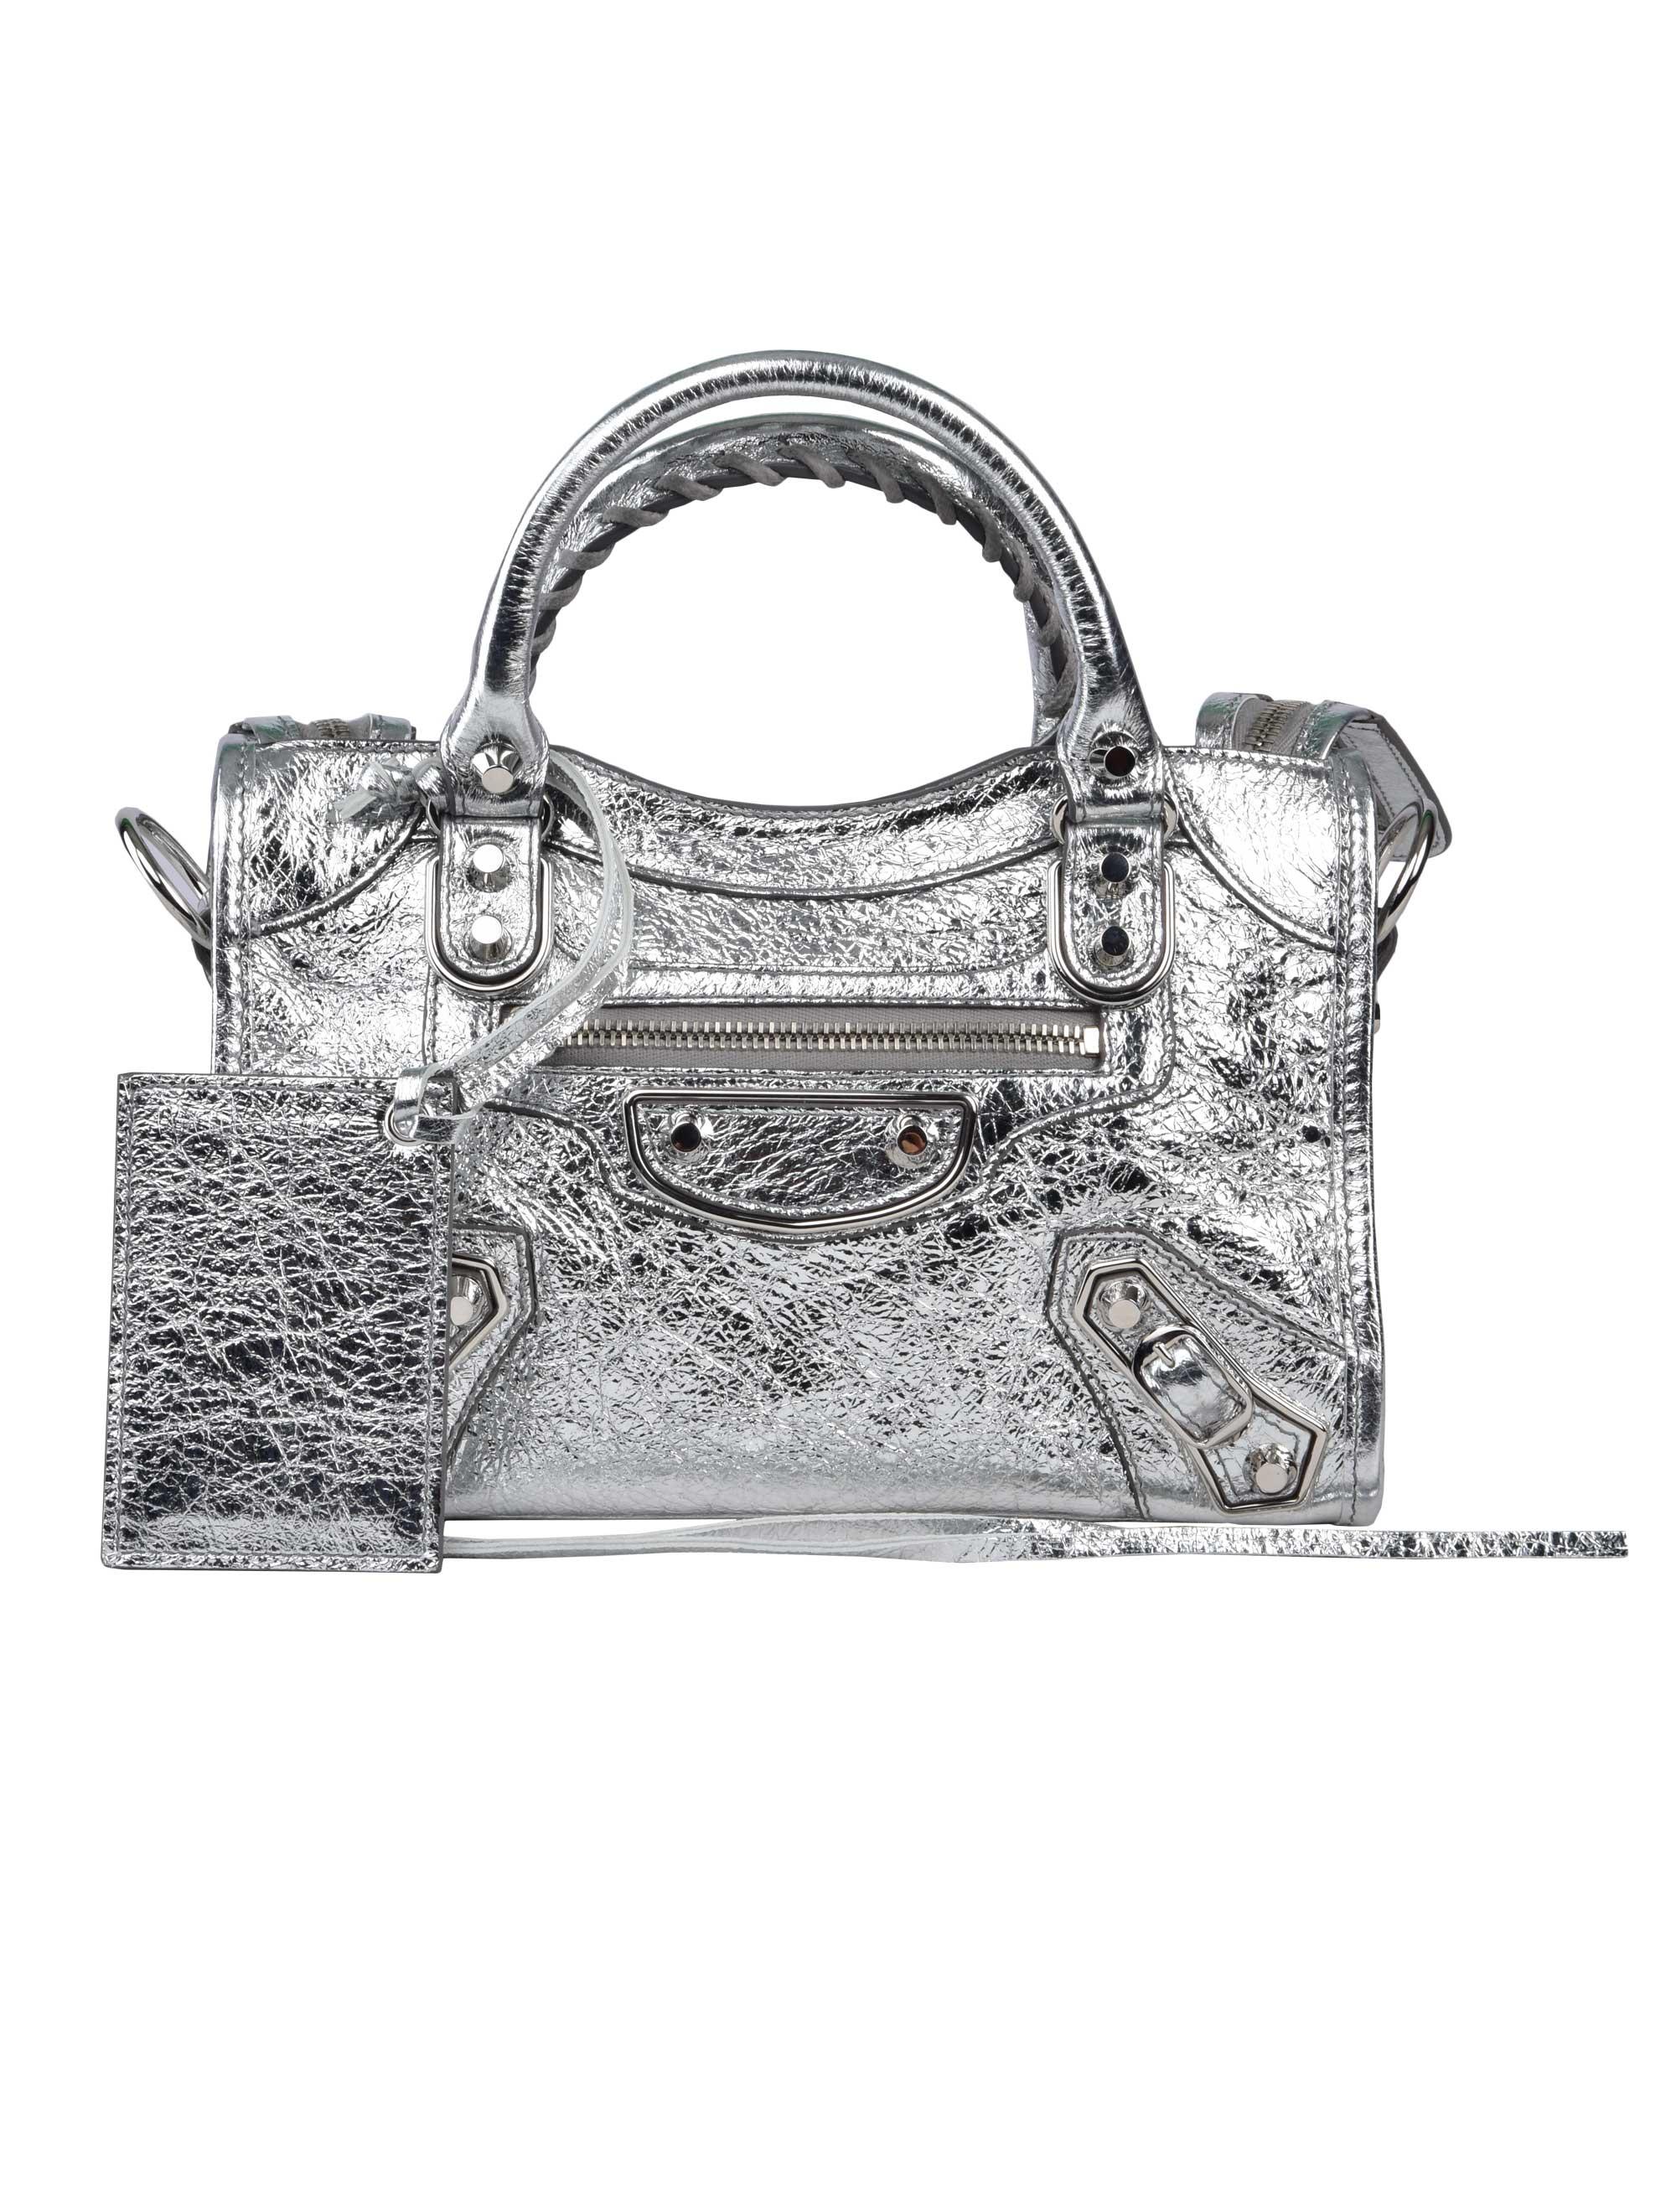 c8a6909118ed Mimma Ninni – Luxury and Fashion Shopping. Balenciaga Silver Classic ...